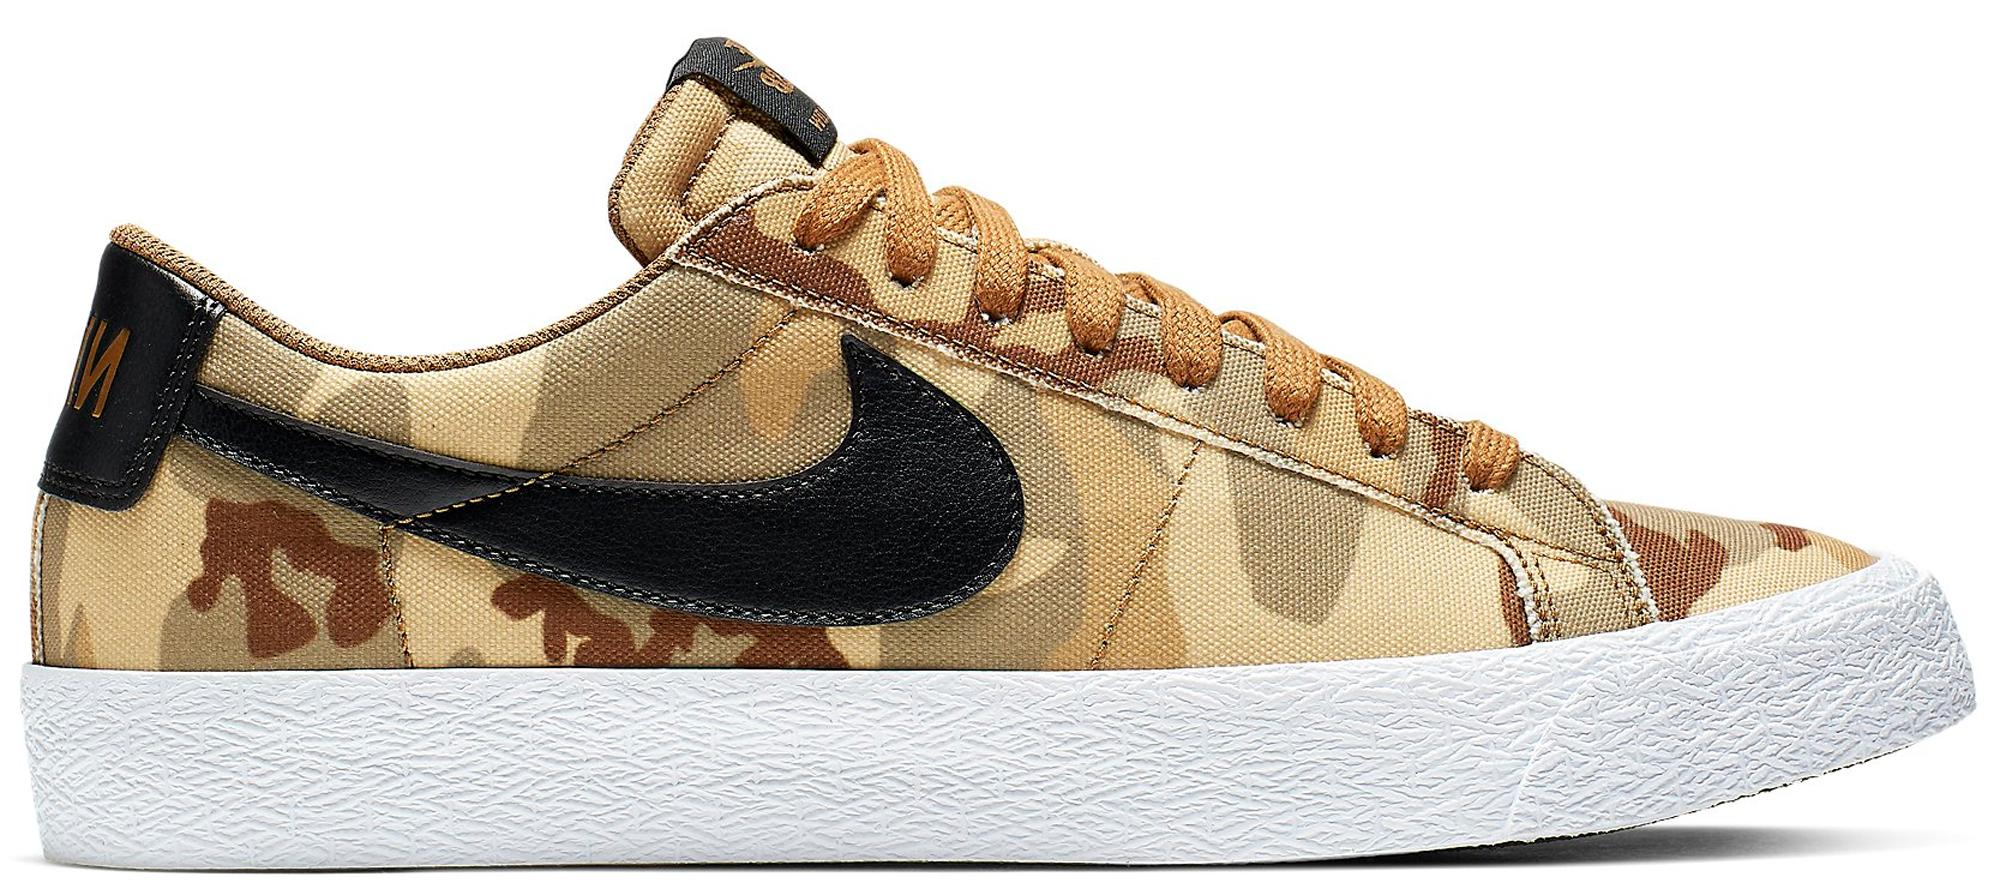 Nike SB Blazer Low Canvas Desert Camo